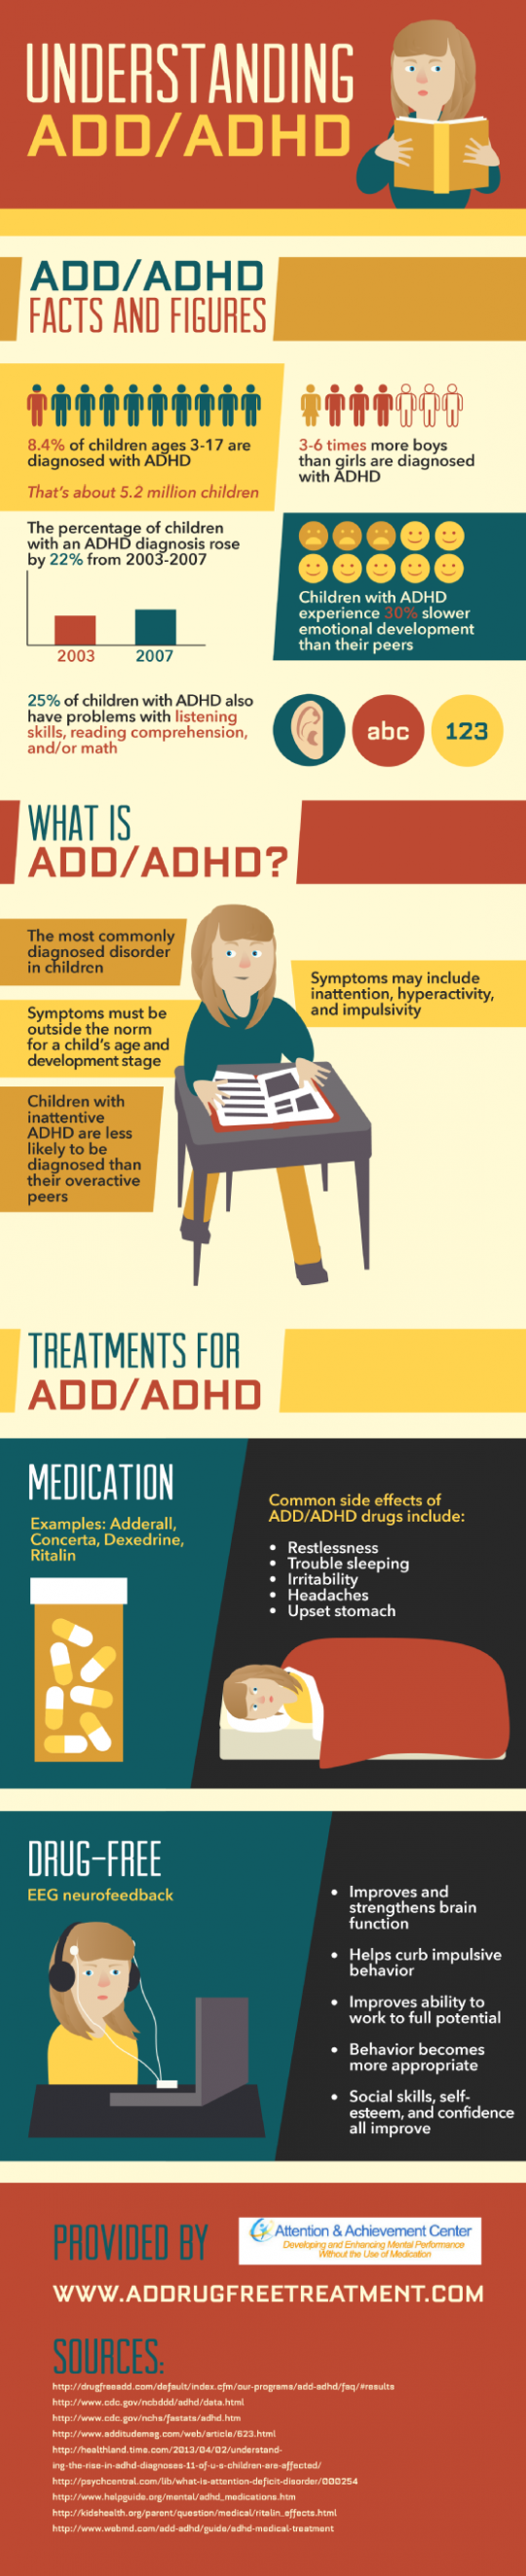 Understanding ADD/ADHD